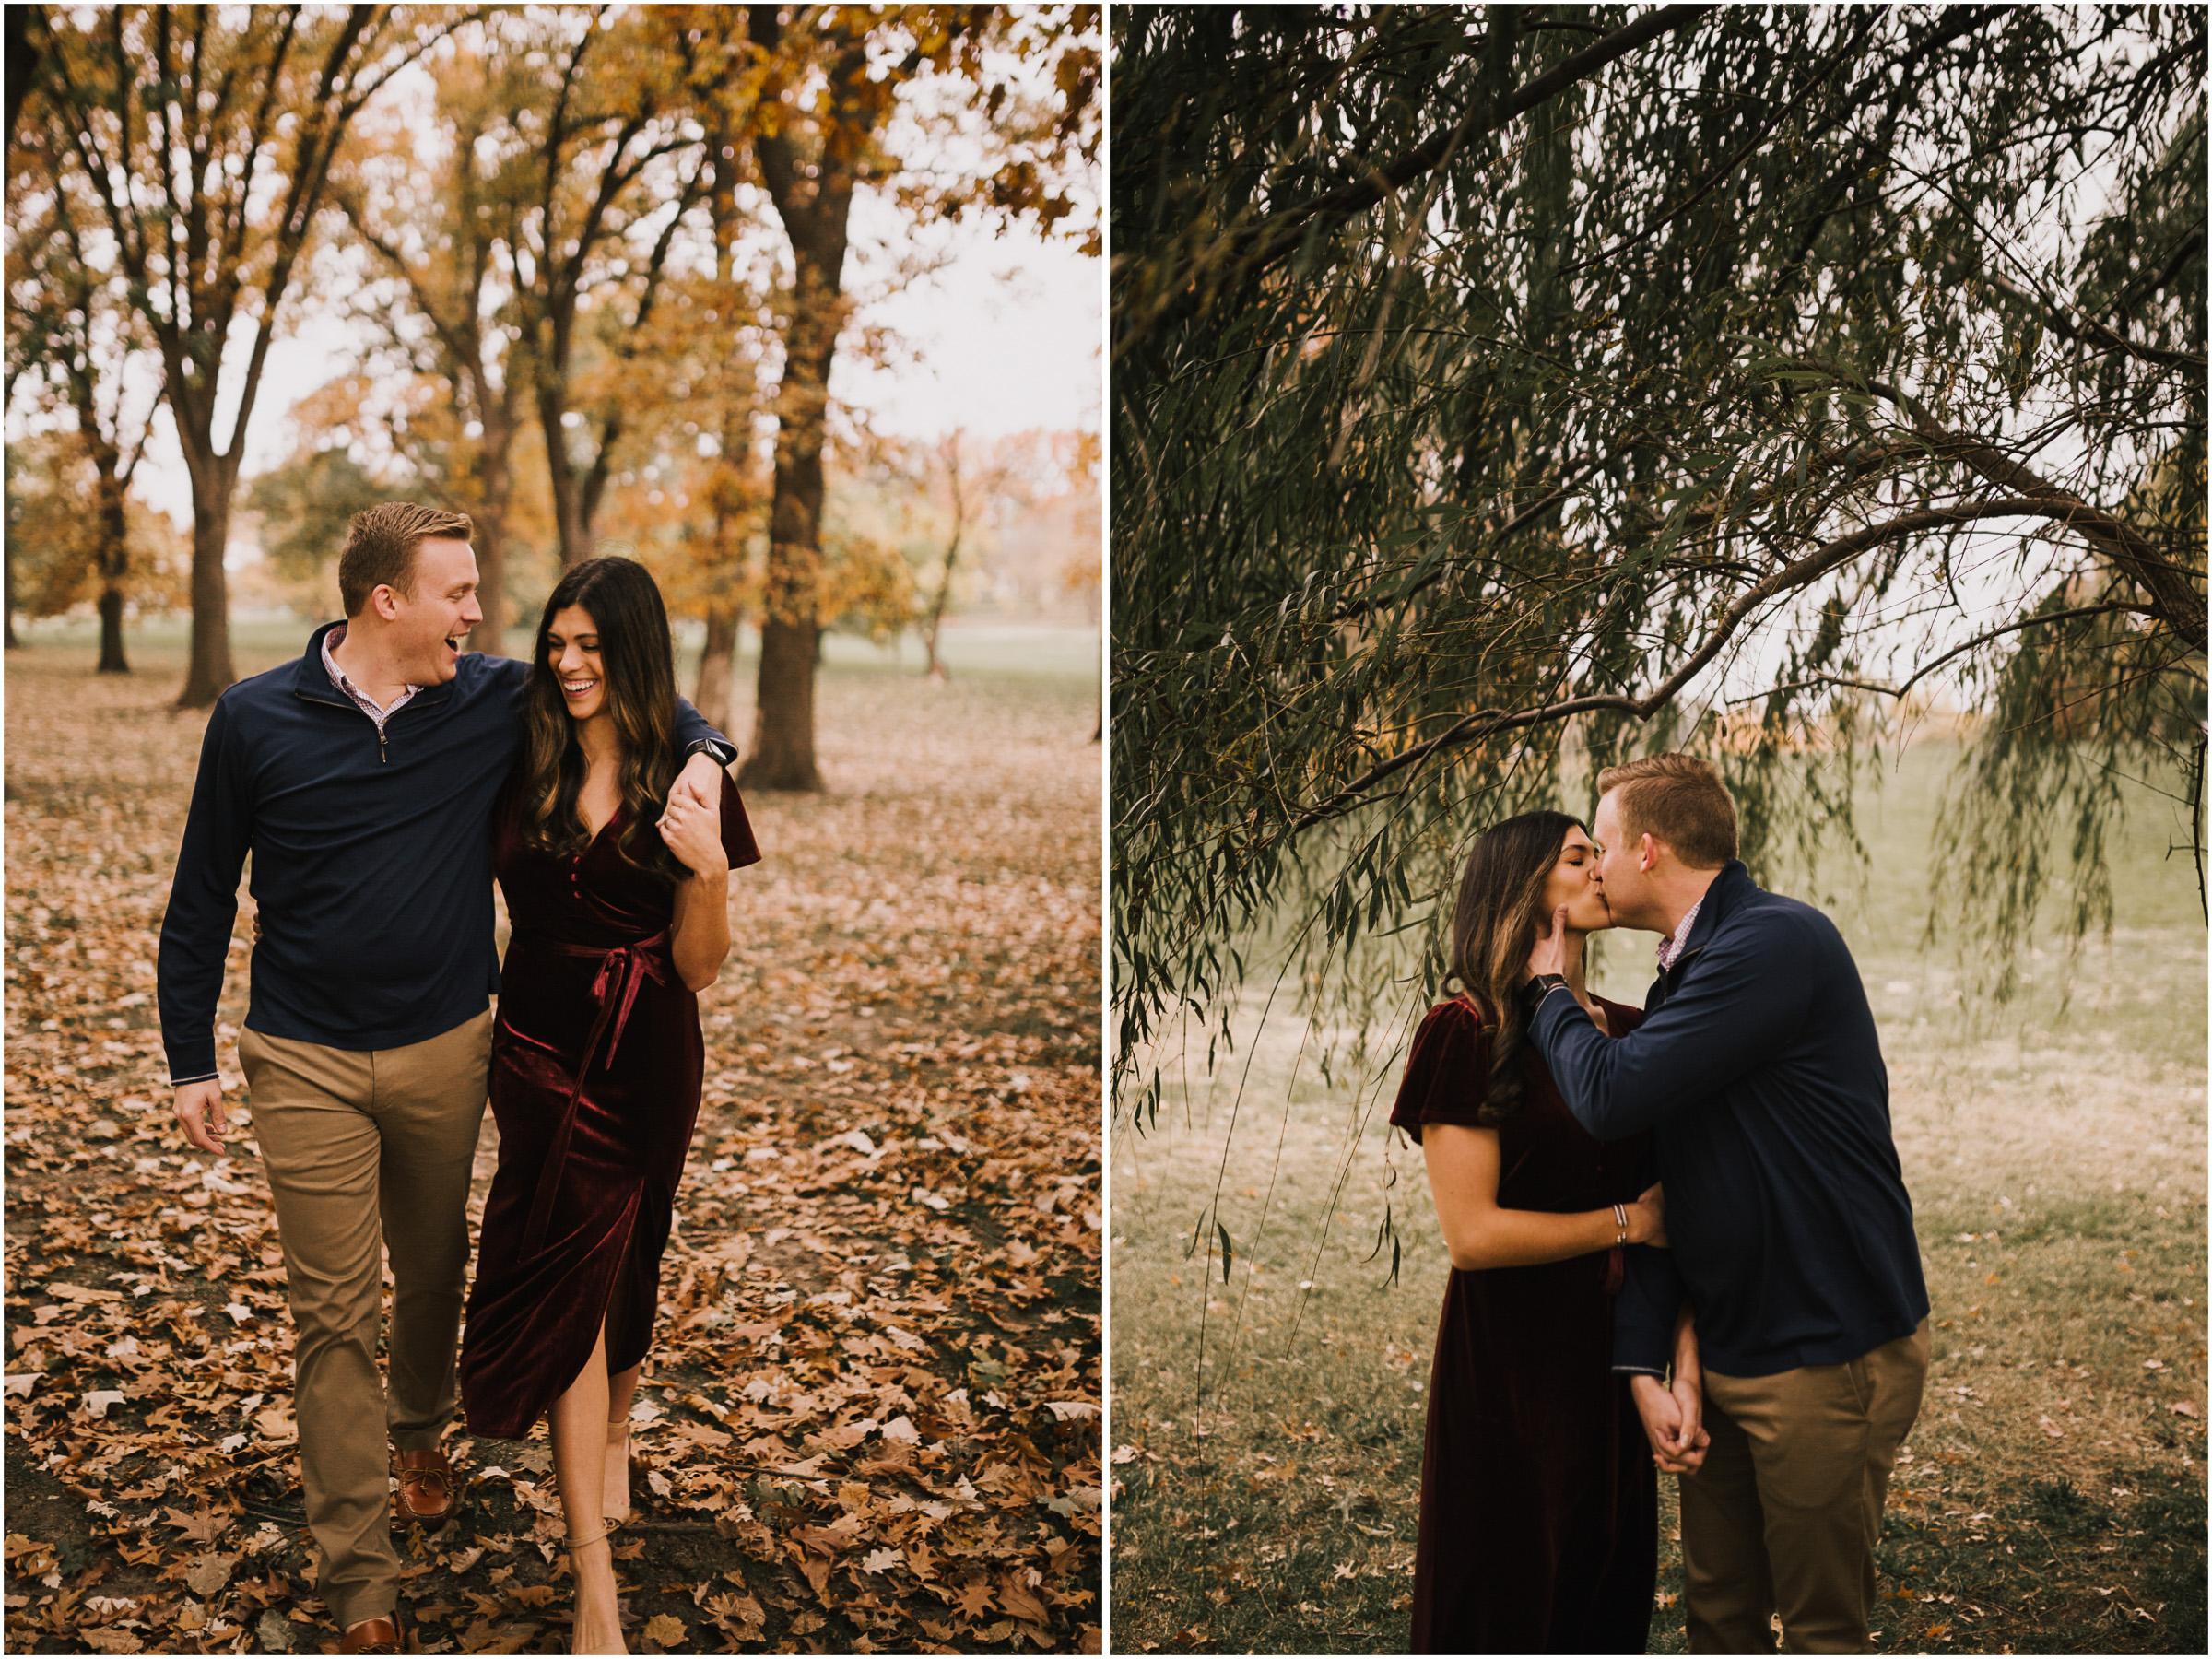 alyssa barletter photography loose park fall engagement photos autumn wedding photography-5.jpg